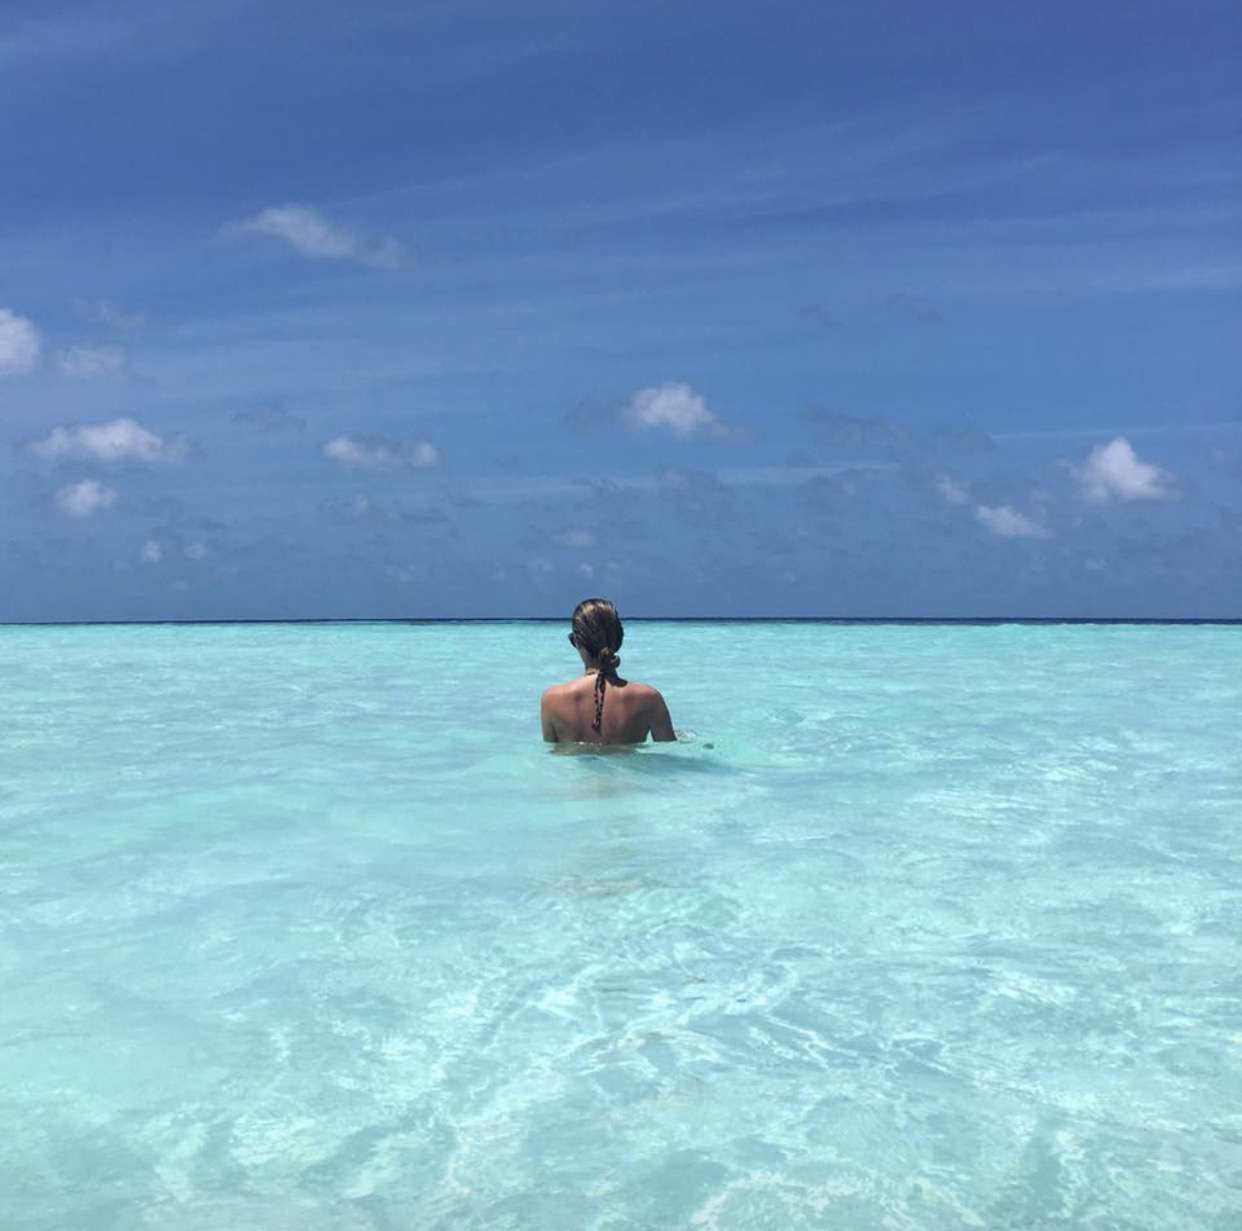 """Endless blue....just can't believe it"" Jennifer Hawkins says of her recent stay at Maldivian beauty Soneva Jani"